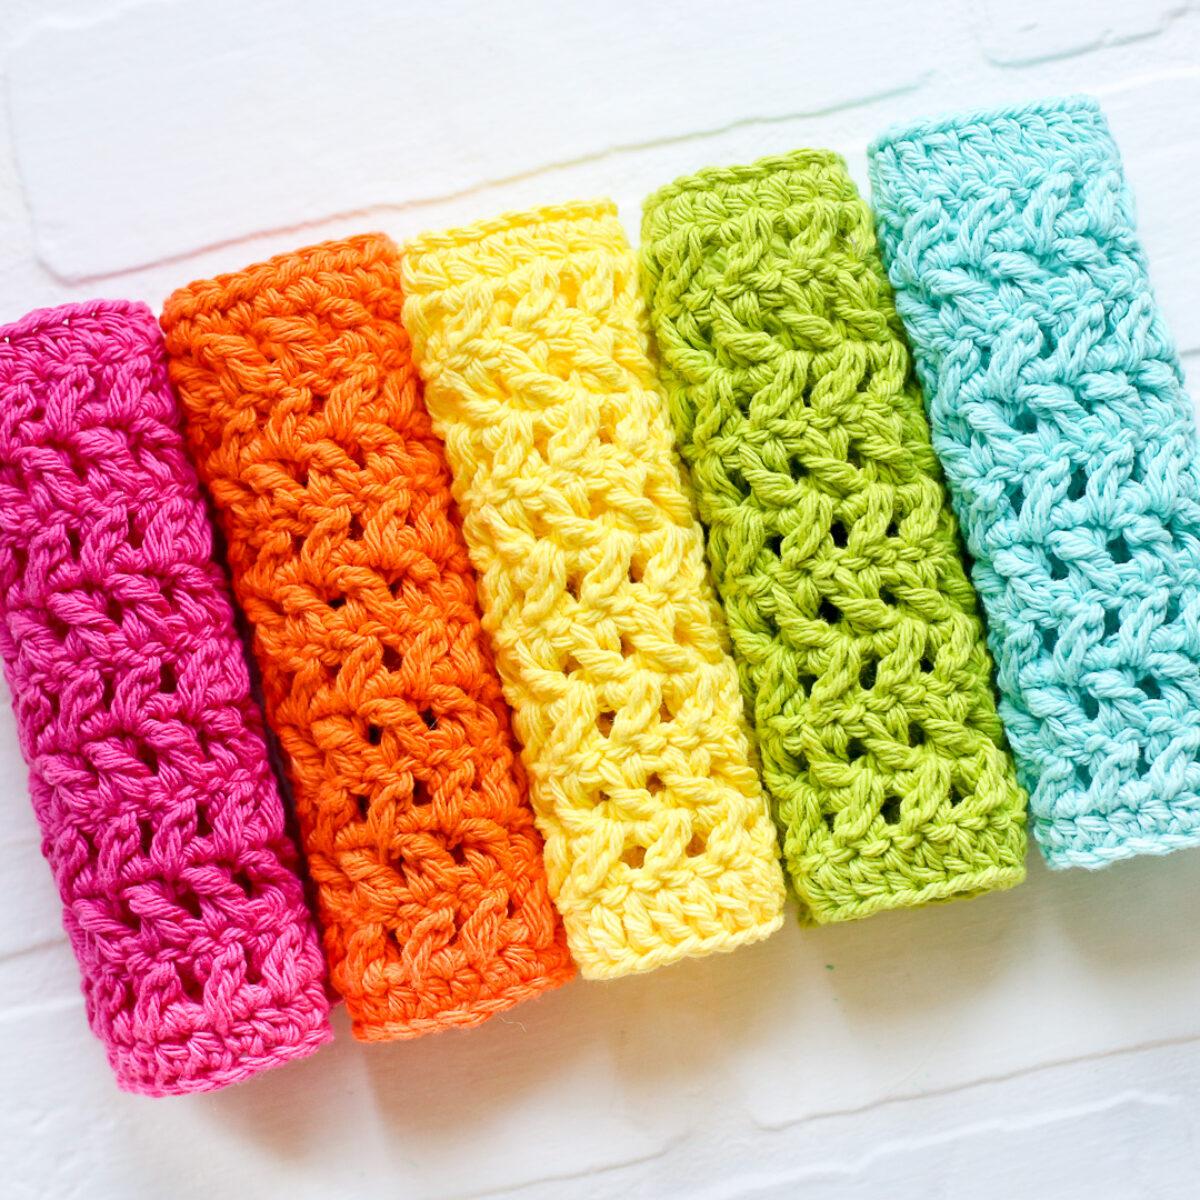 Crochet Dishcloth Herringbone Pattern Sugar Bee Crafts